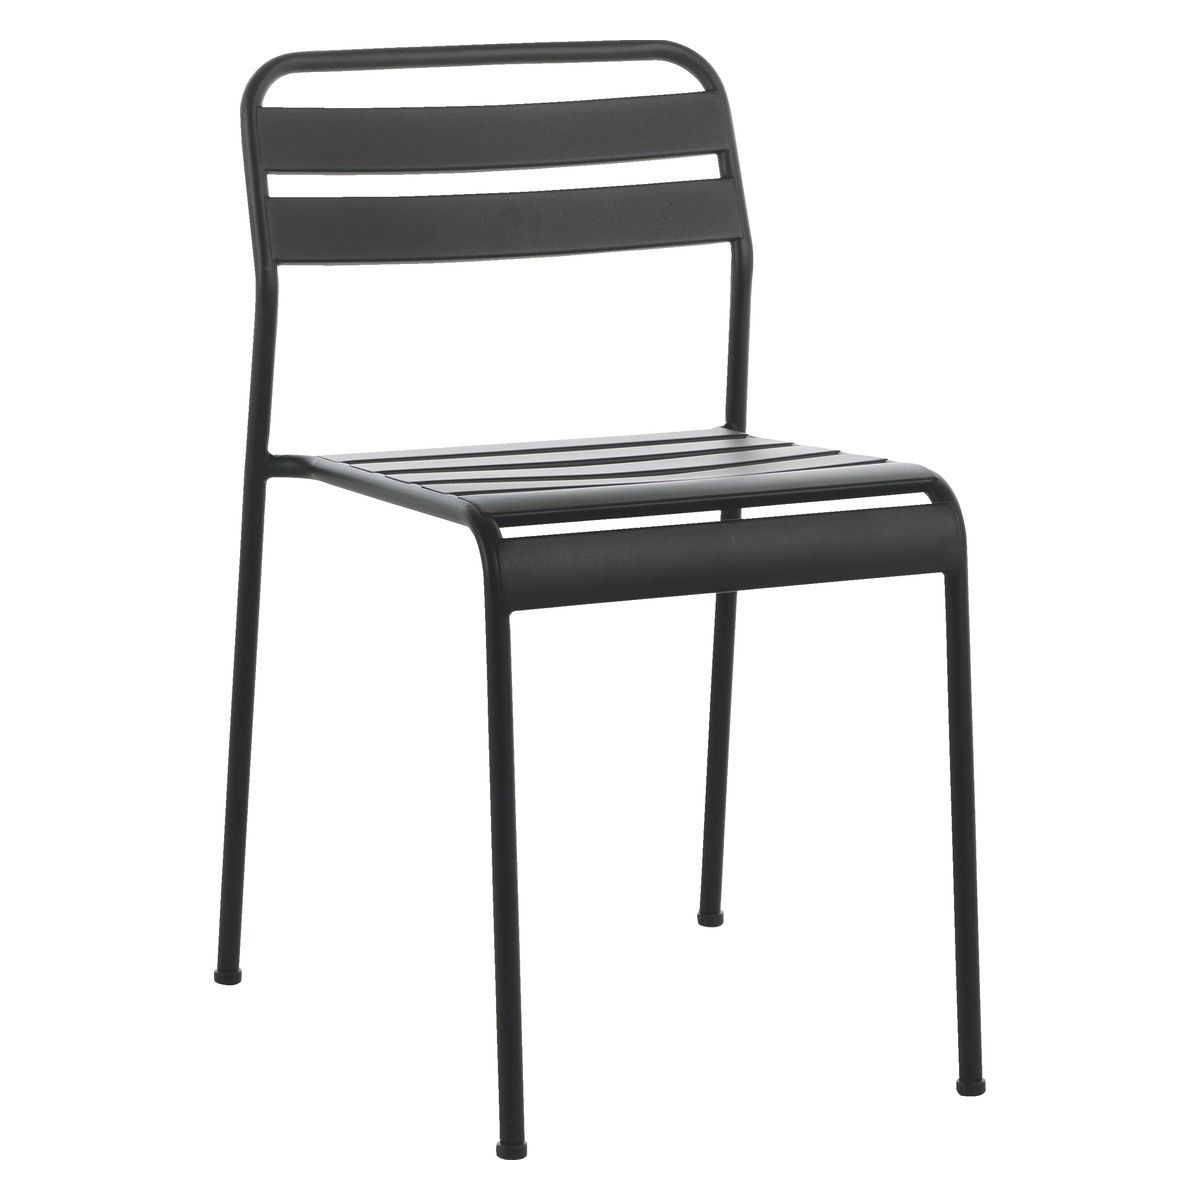 becklen black metal garden chair